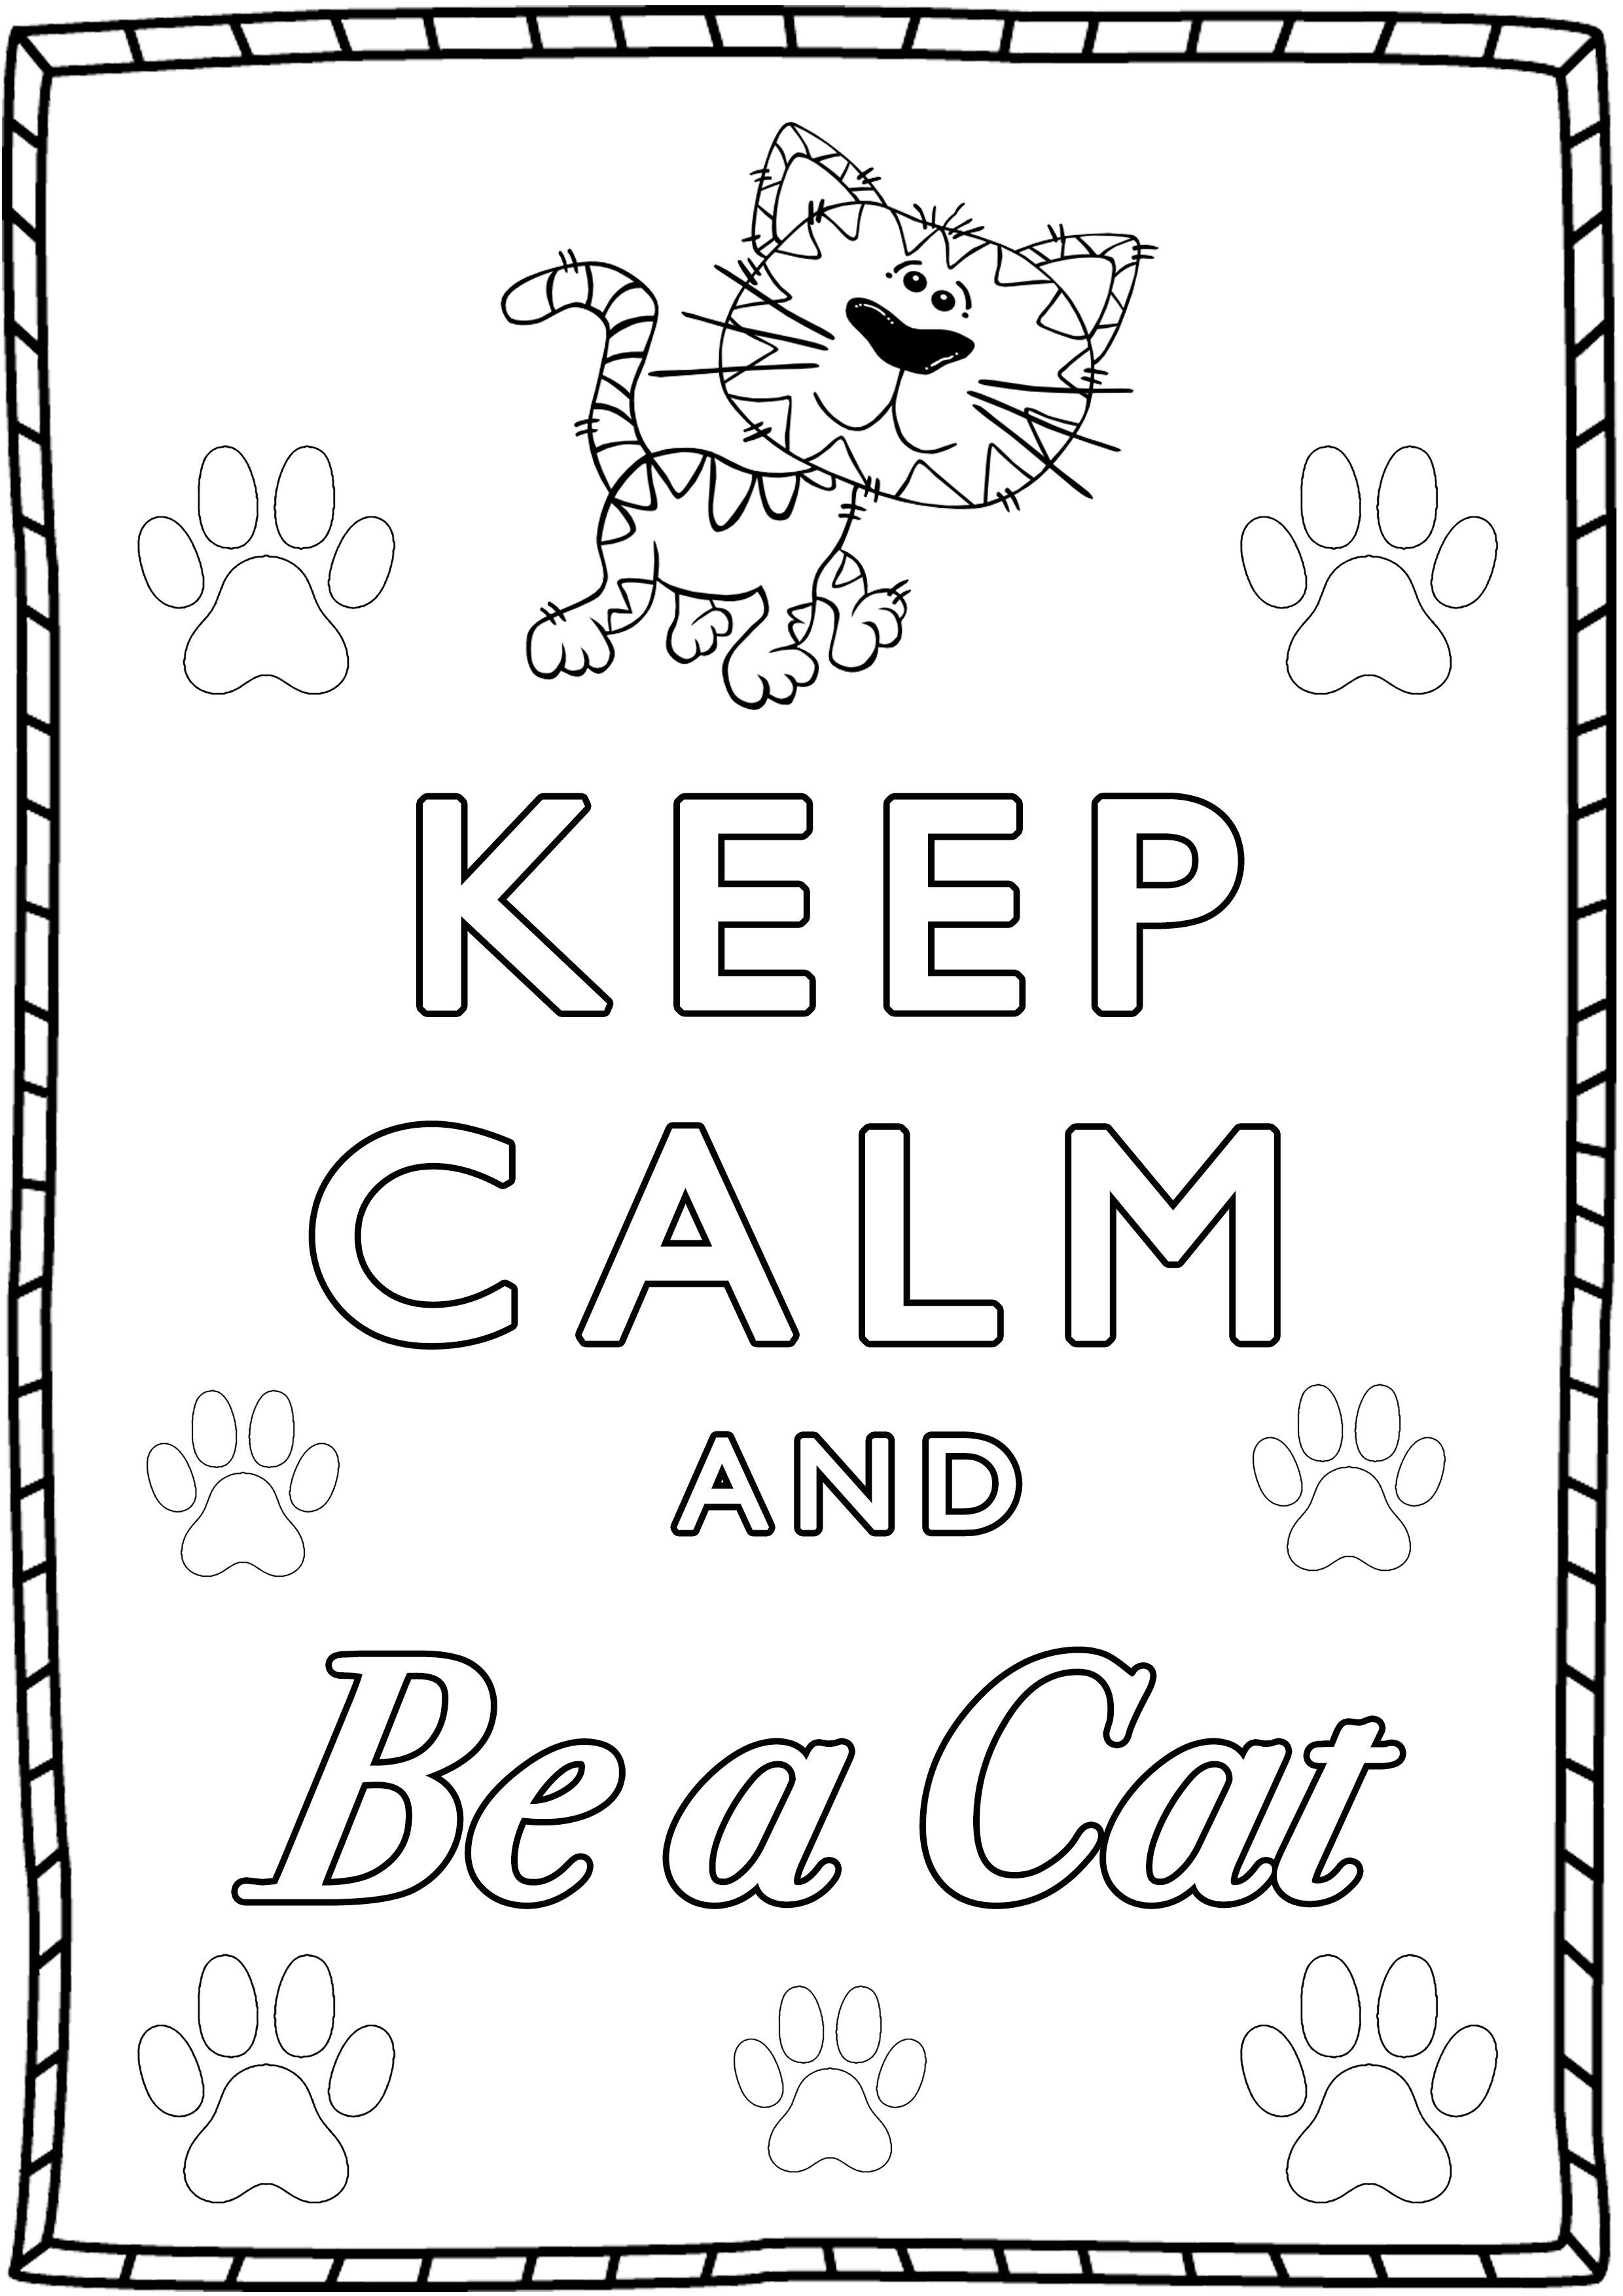 Keep Calm and Be a Cat : A cute little cat